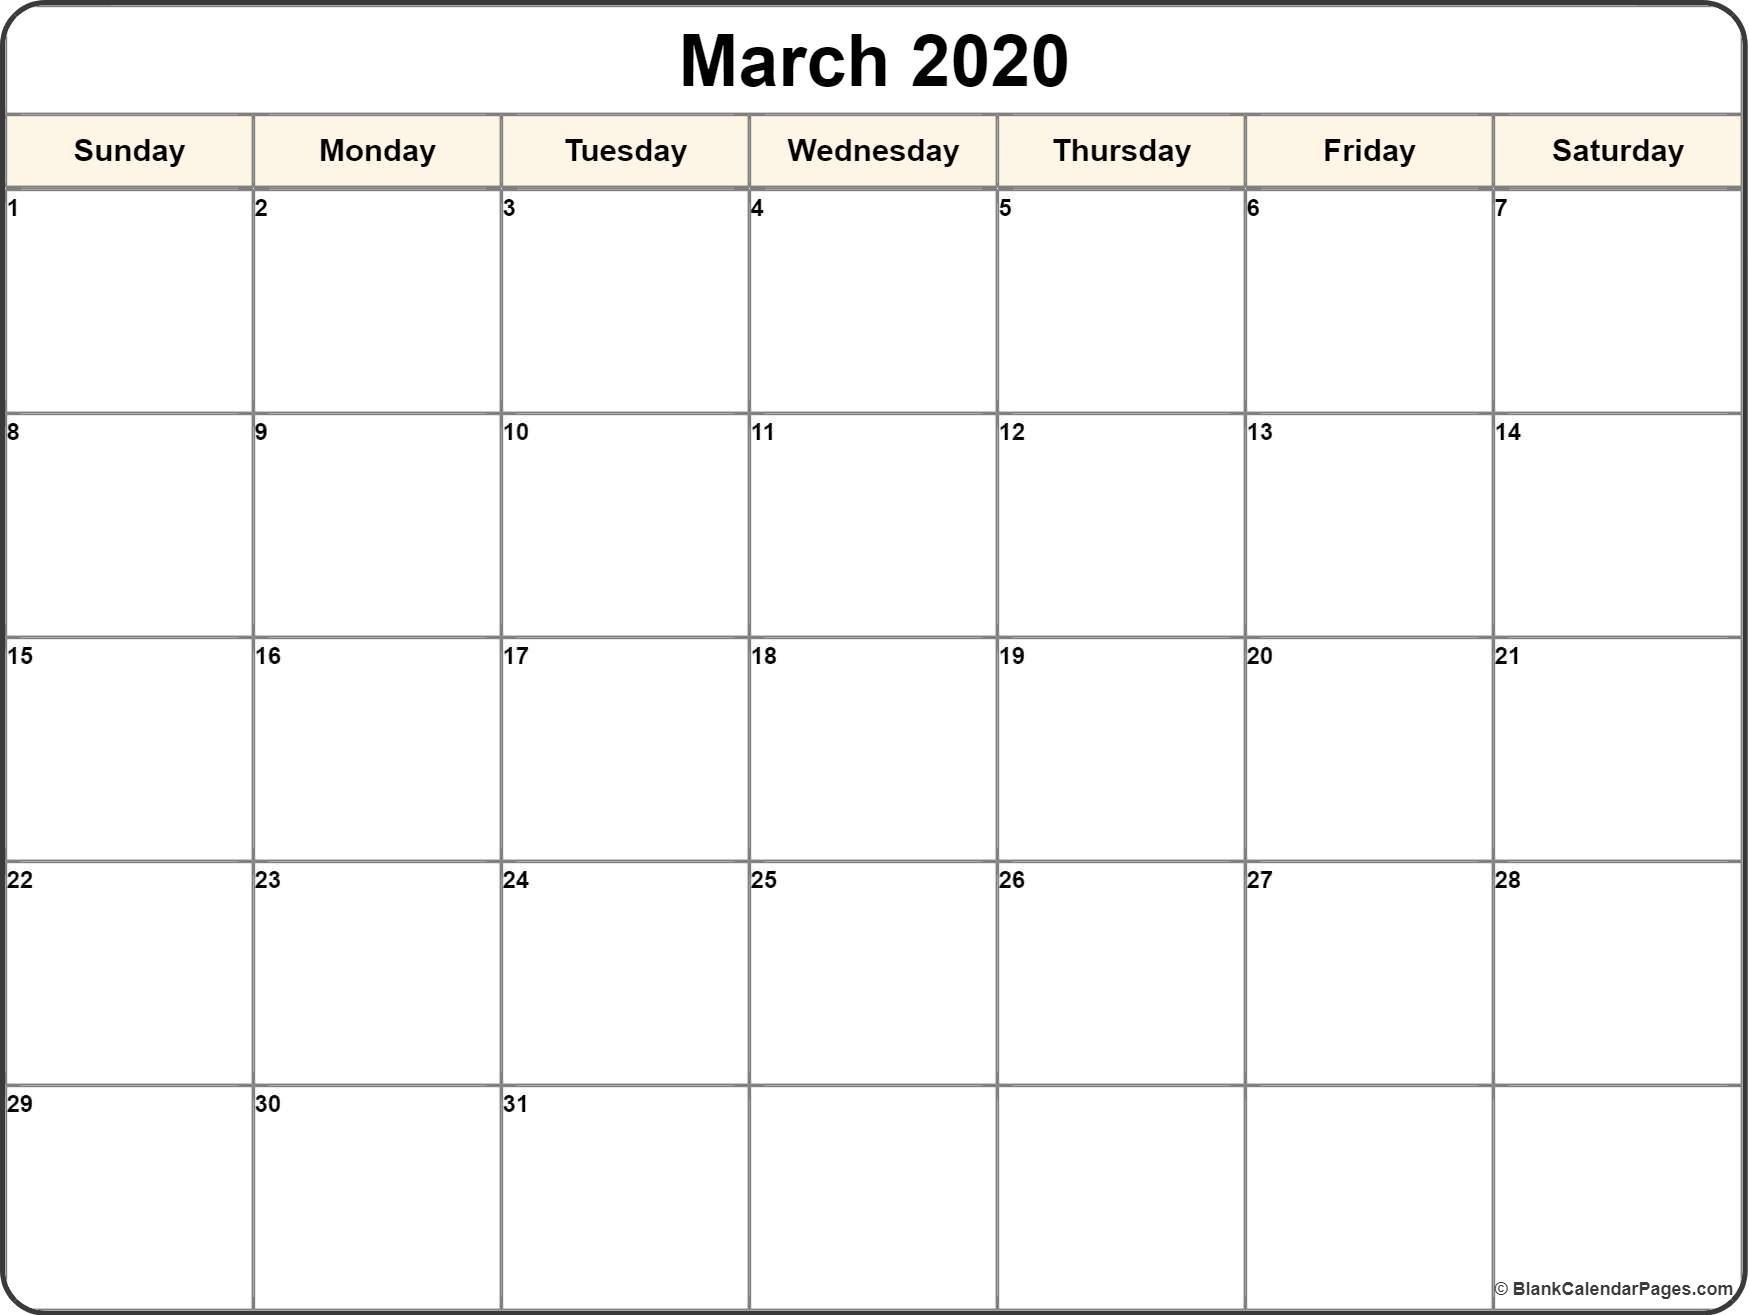 Calendar Template 2020 | One Page Calendar Printable_Blank Calendar Sheets 2020